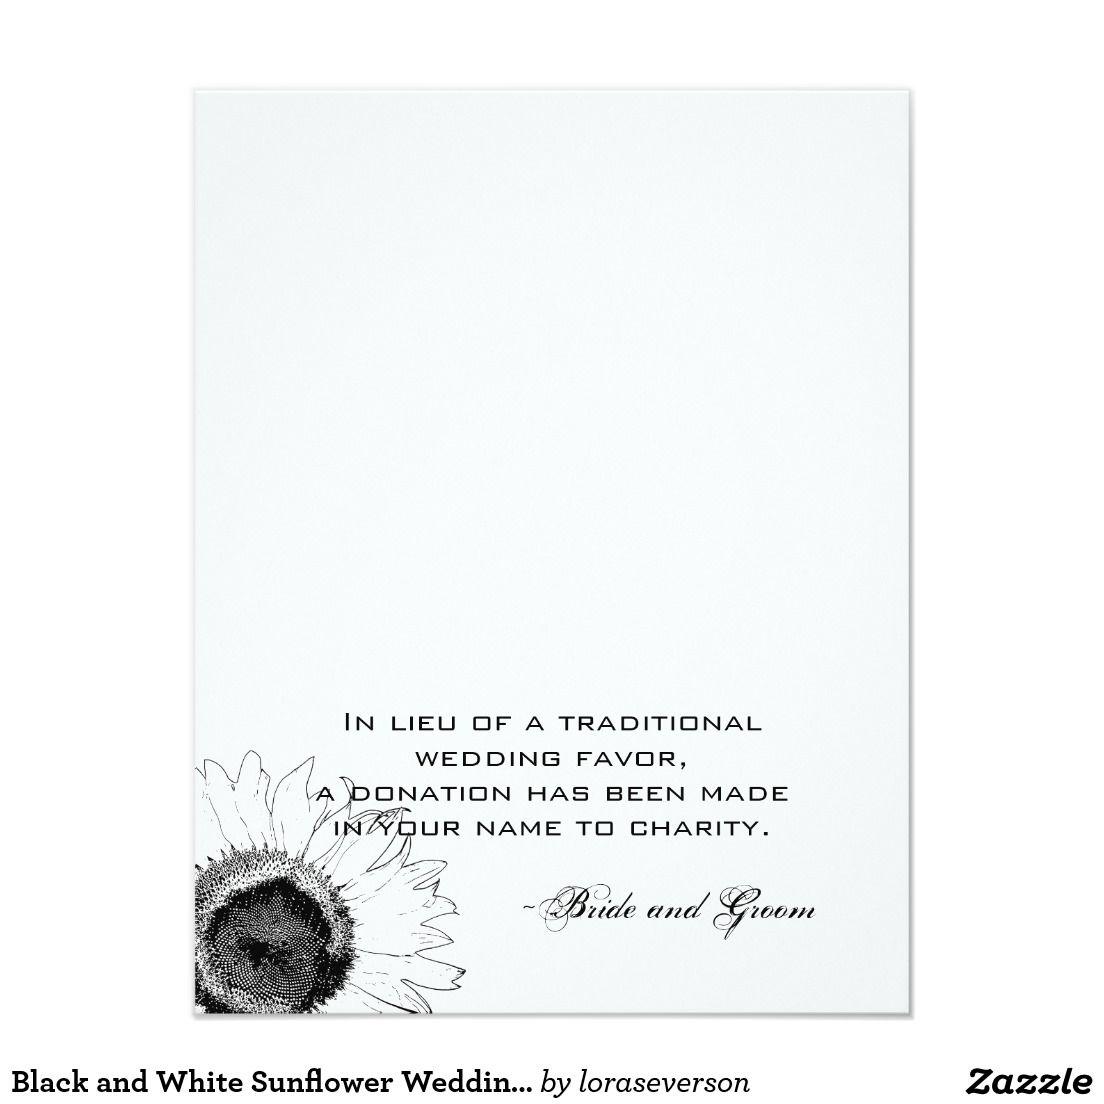 Black and White Sunflower Wedding Charity Favor Invitation ...